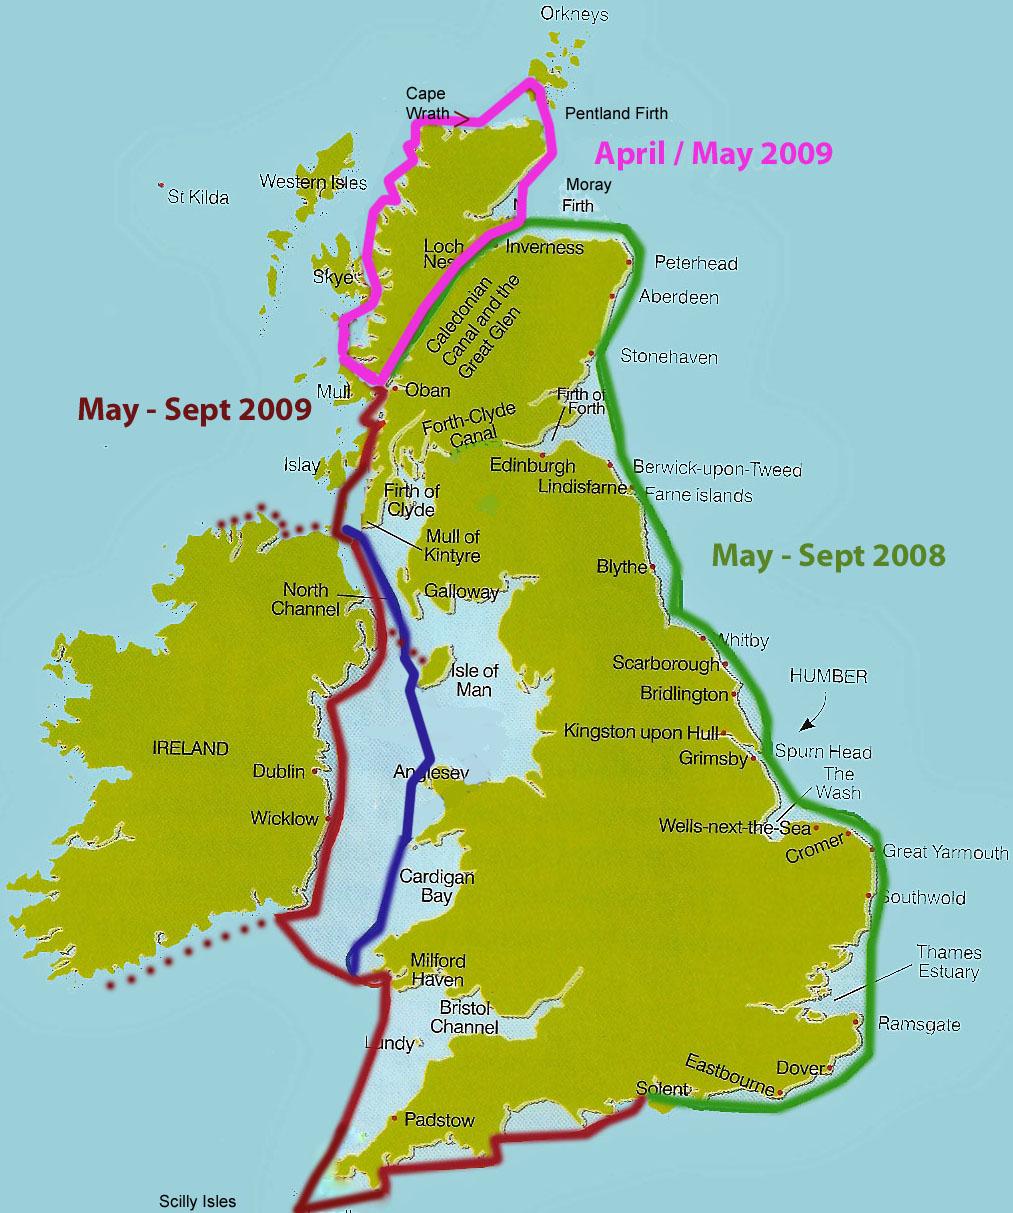 Passage Plan 2008 - 2009